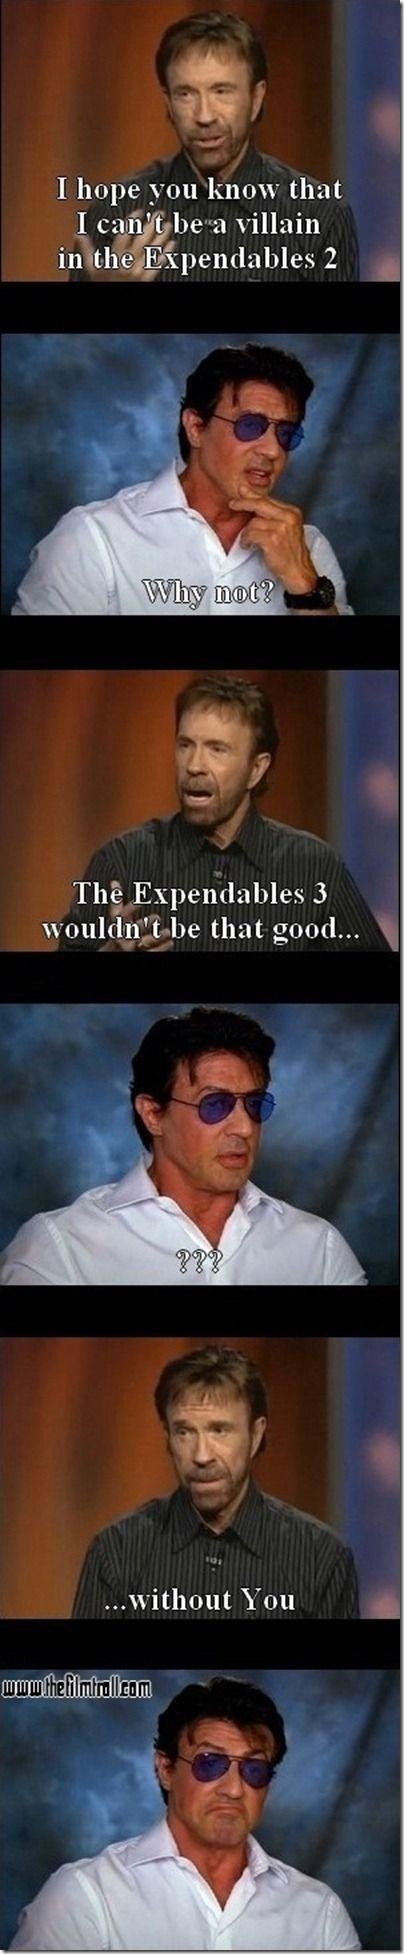 Chuck Norris warning